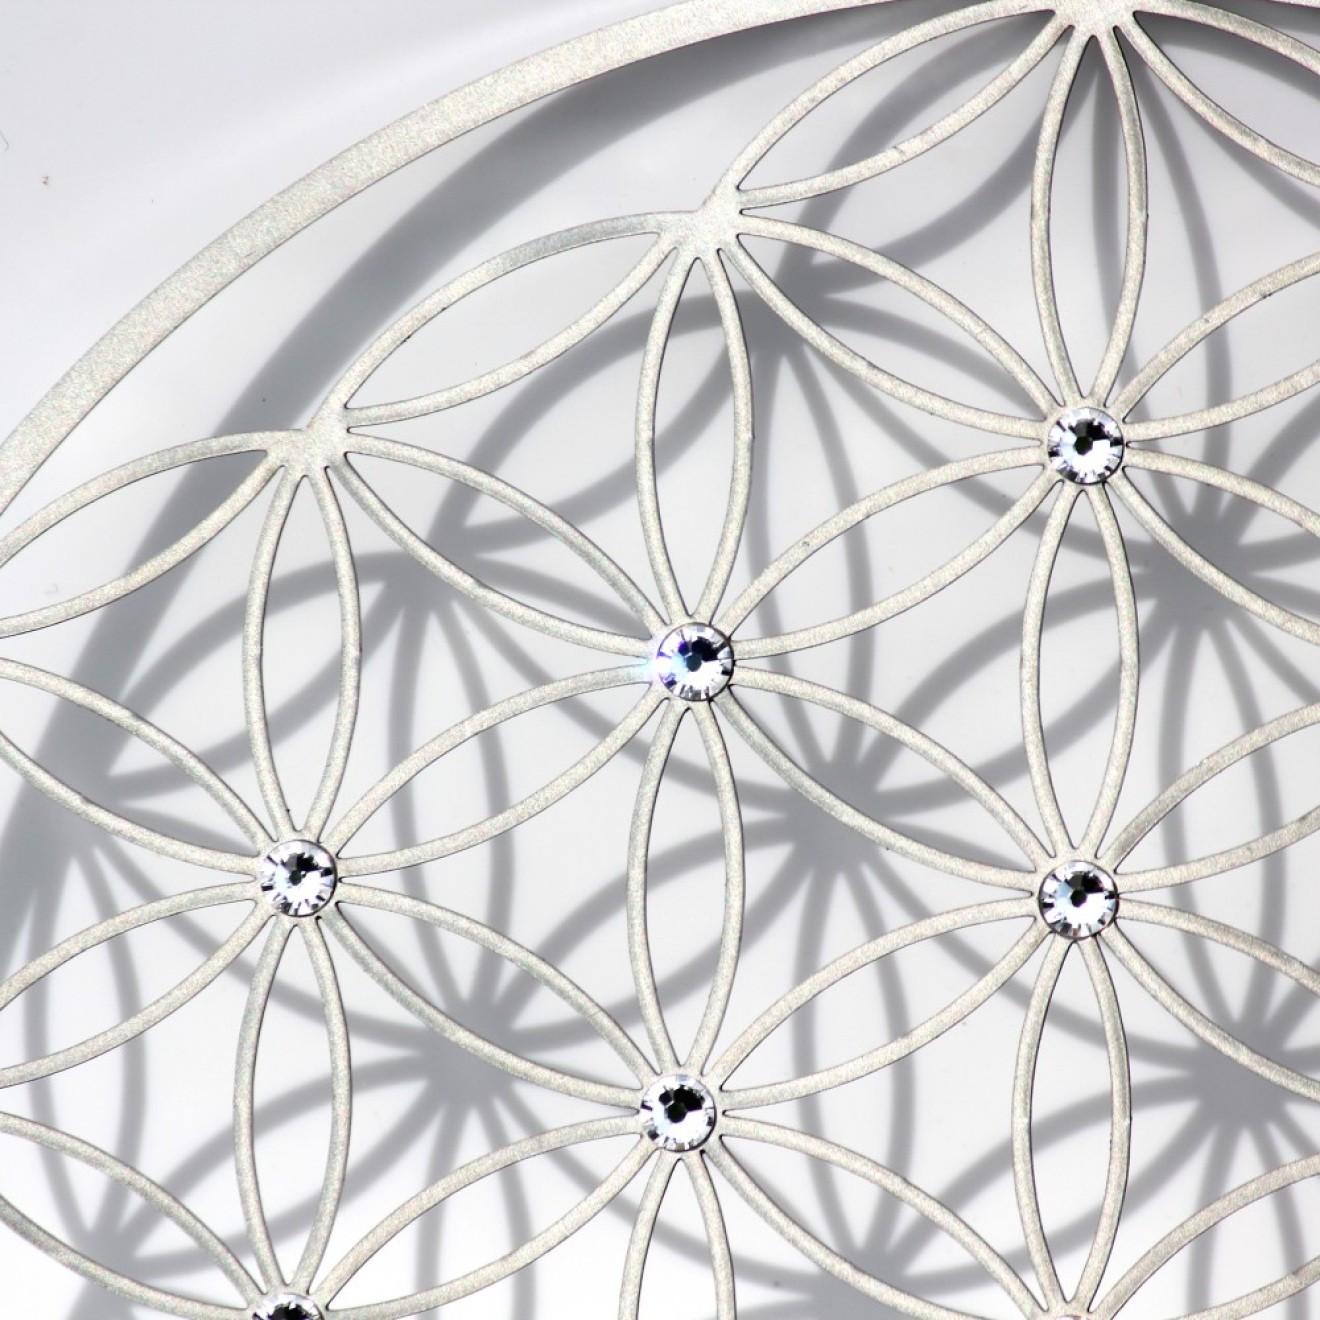 metall wandschmuck blume des lebens swarovski kristallen. Black Bedroom Furniture Sets. Home Design Ideas